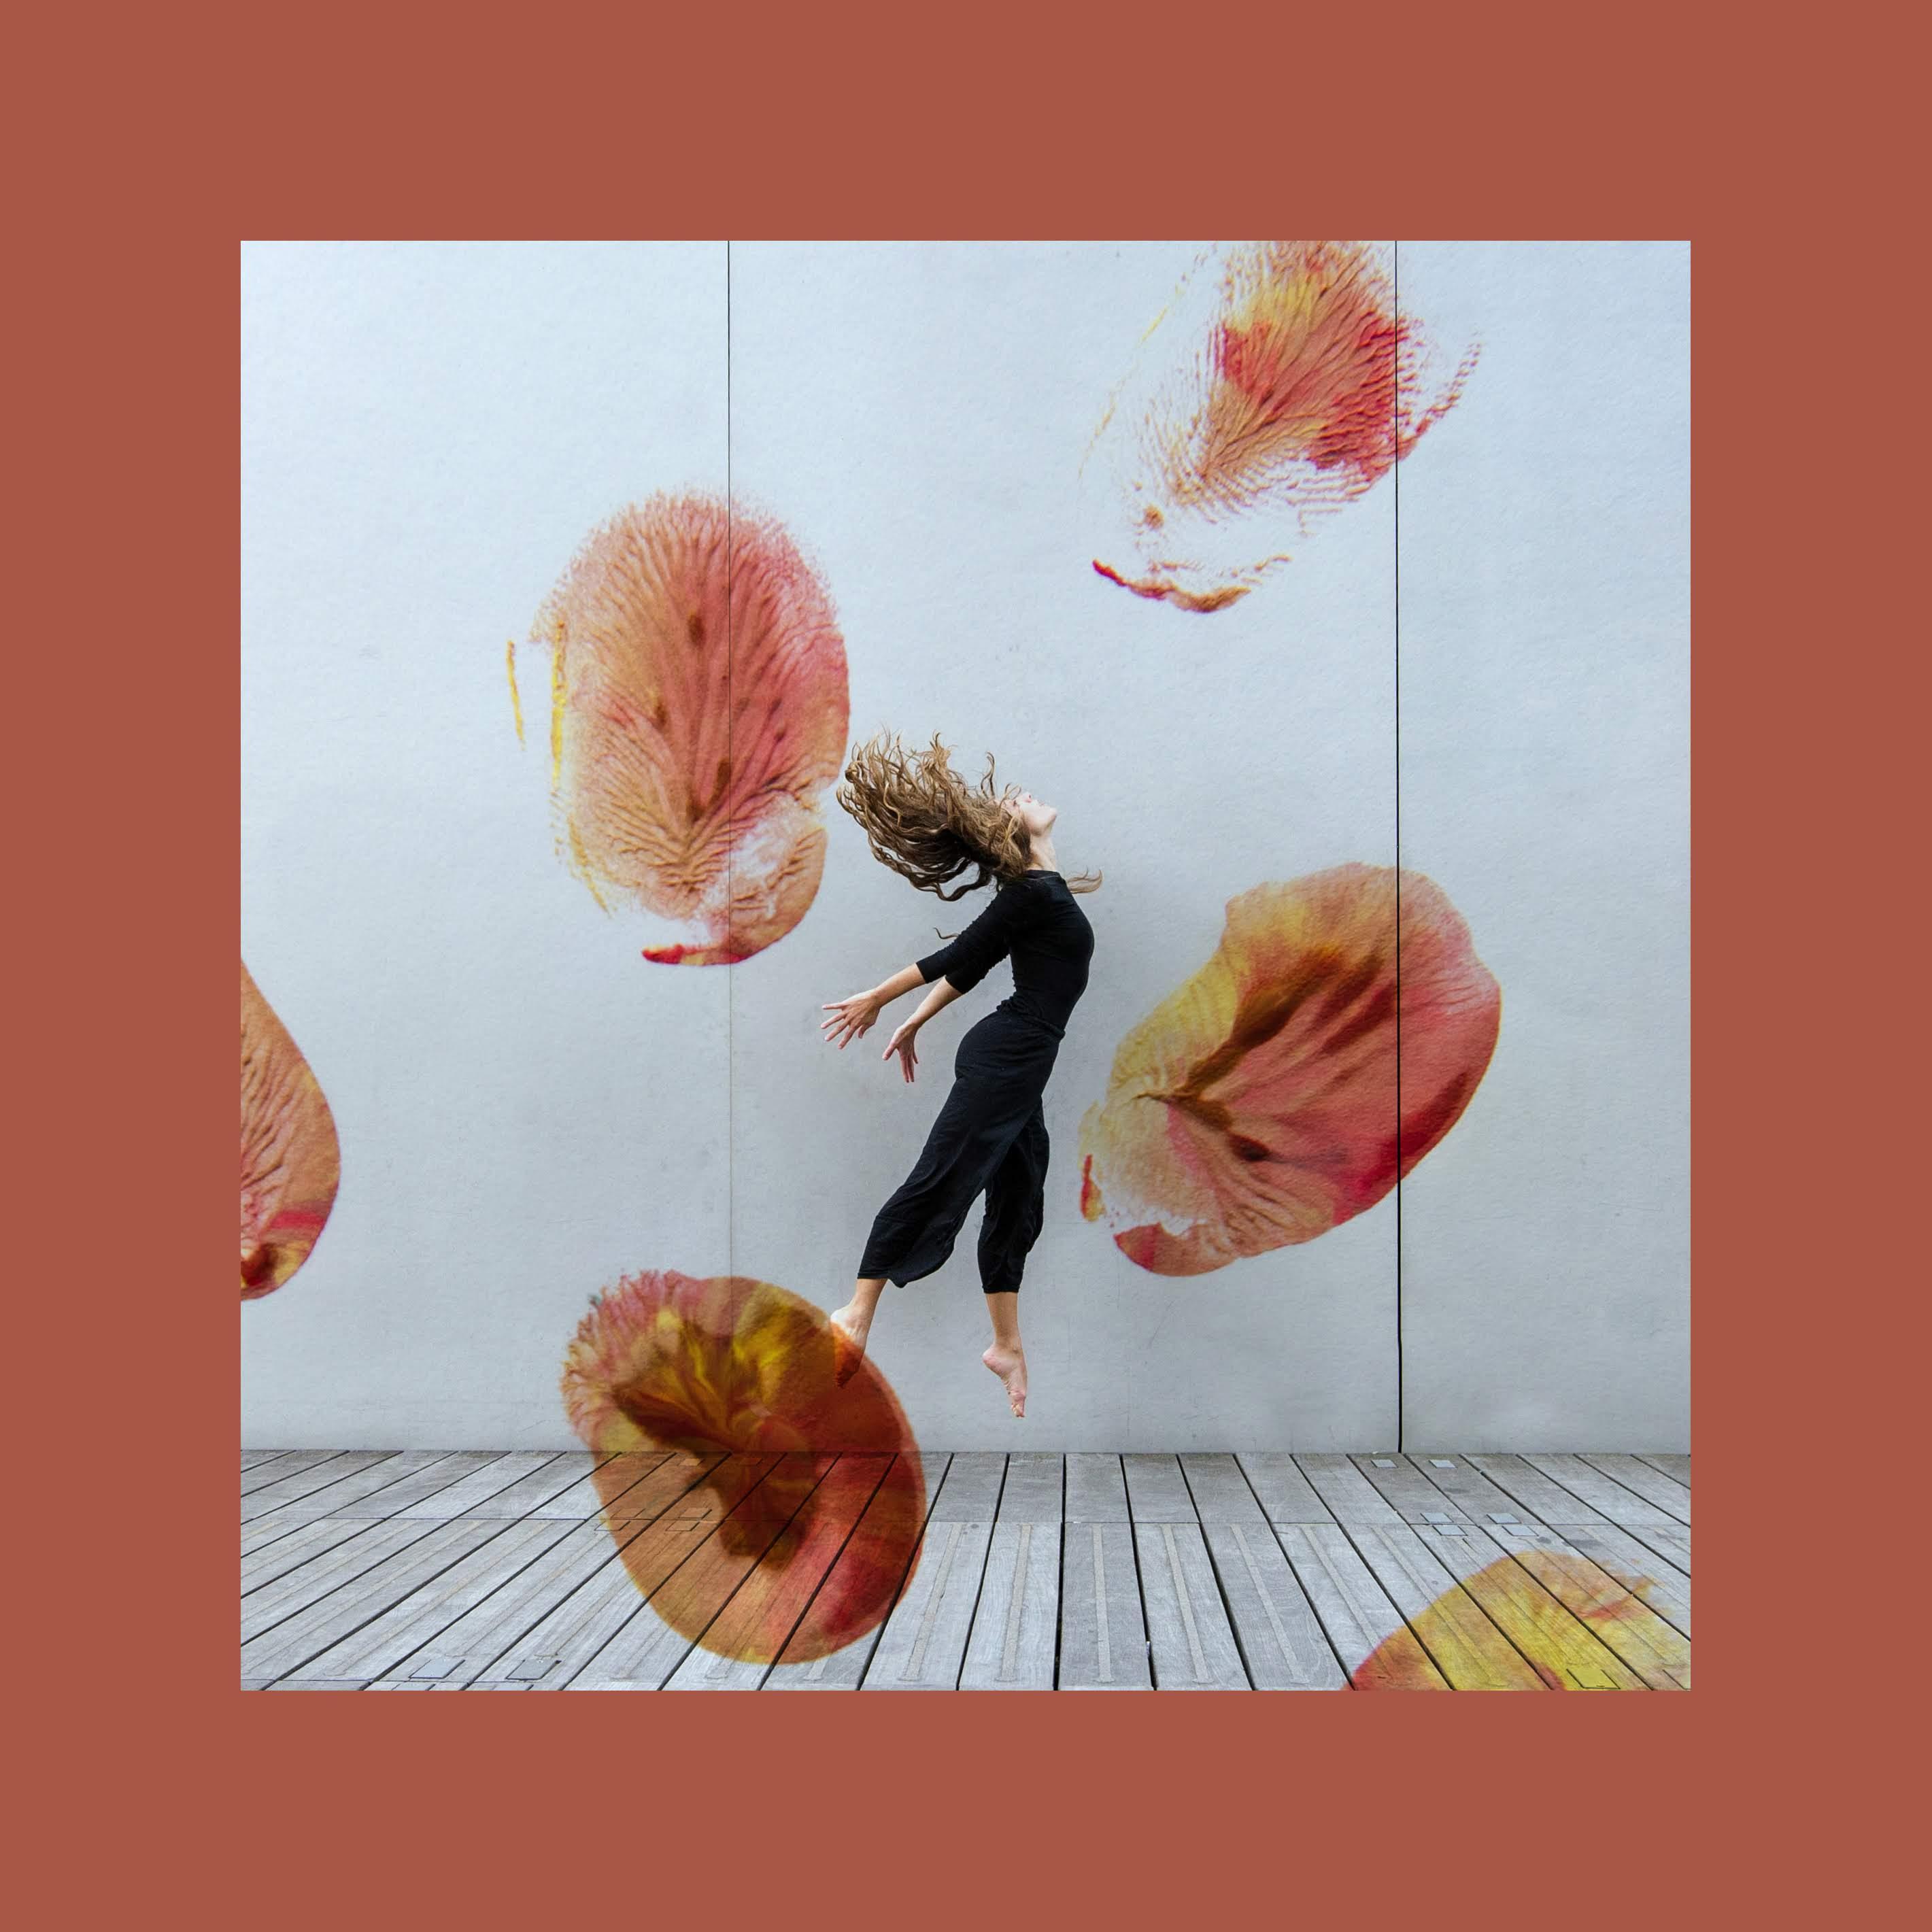 Free Spirit Foundation - Motus Chroma - Nora Houguenade